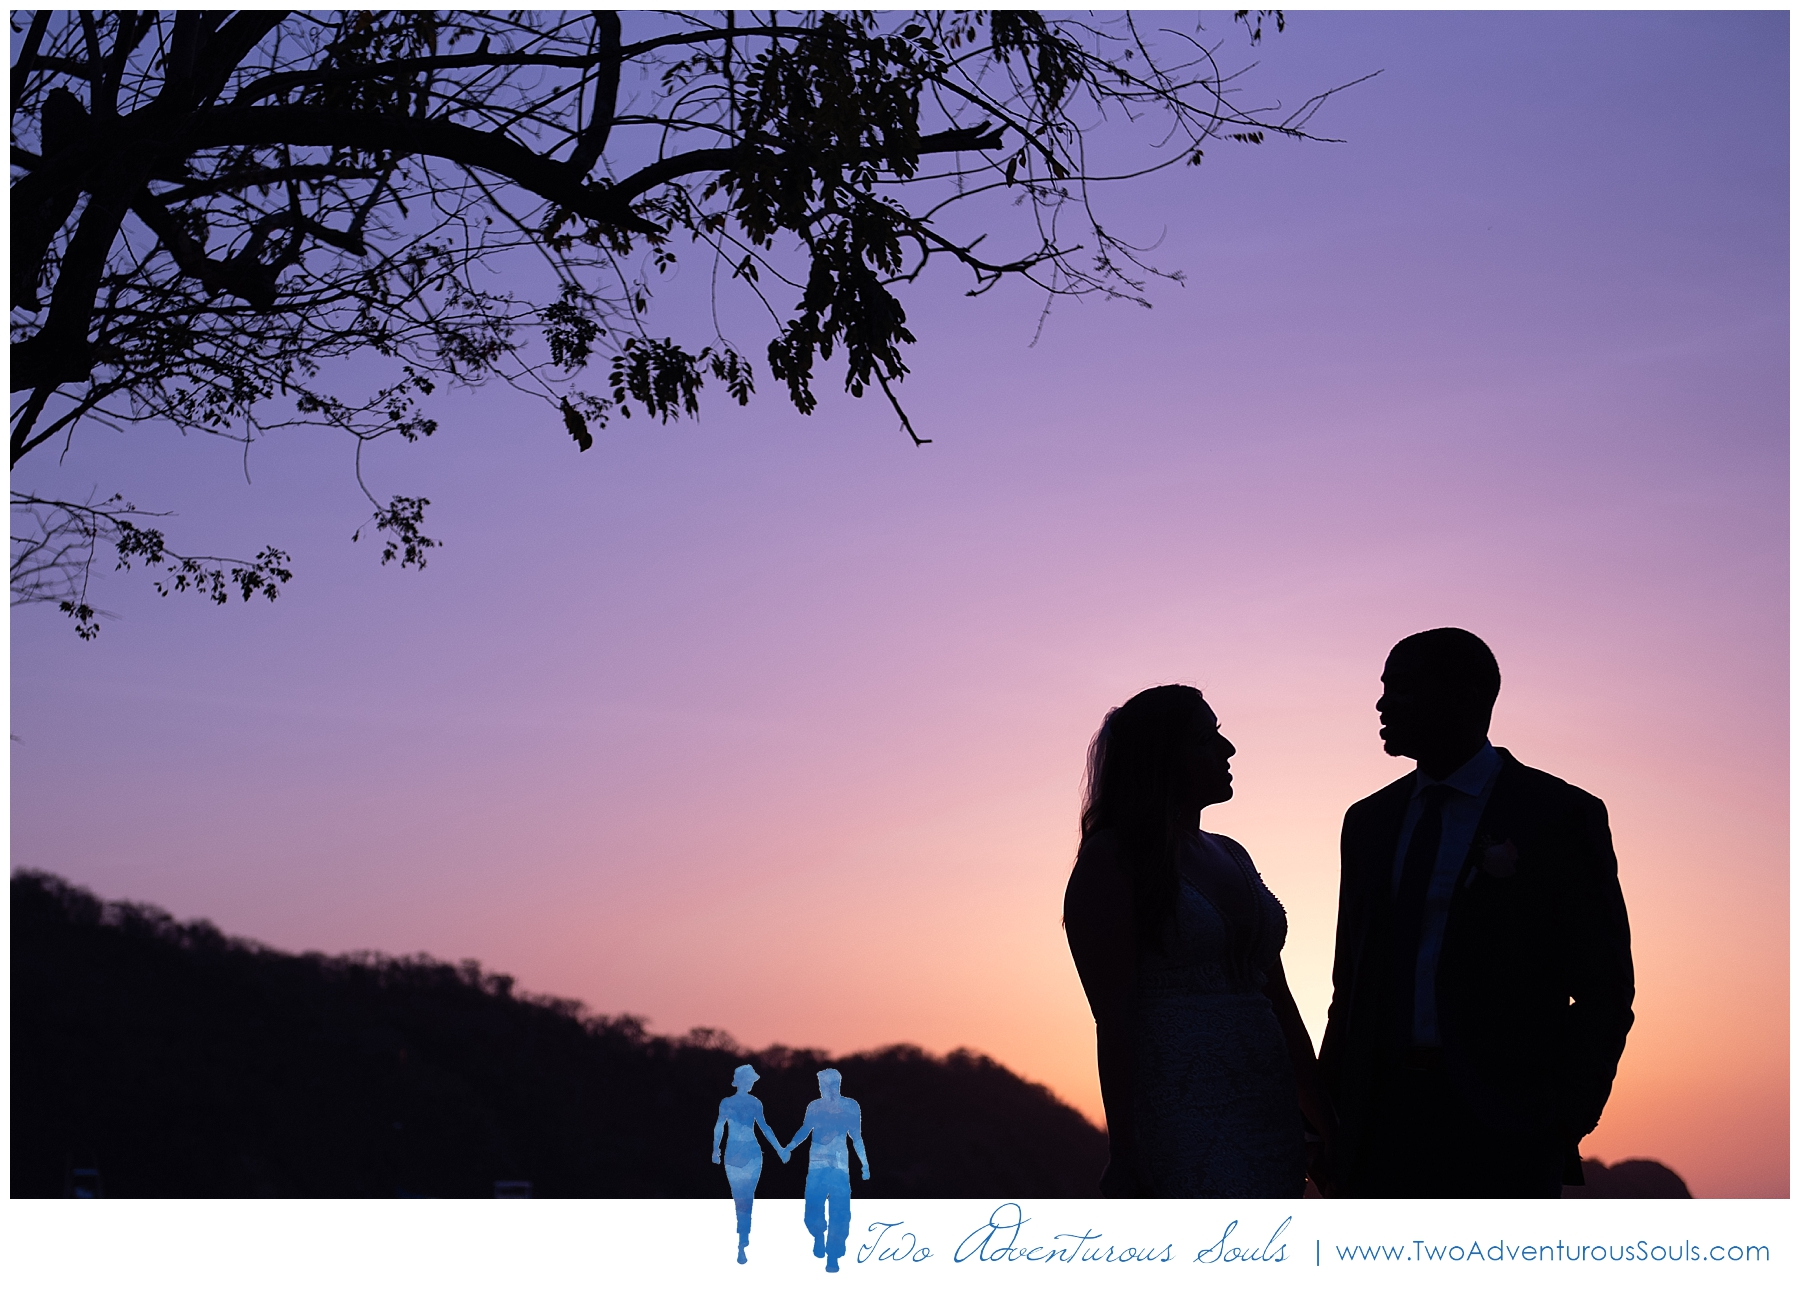 Costa Rica Wedding Photographers, Dreams las Mareas Wedding, Destination Wedding Photographers, Two Adventurous Souls - 022219_0035.jpg